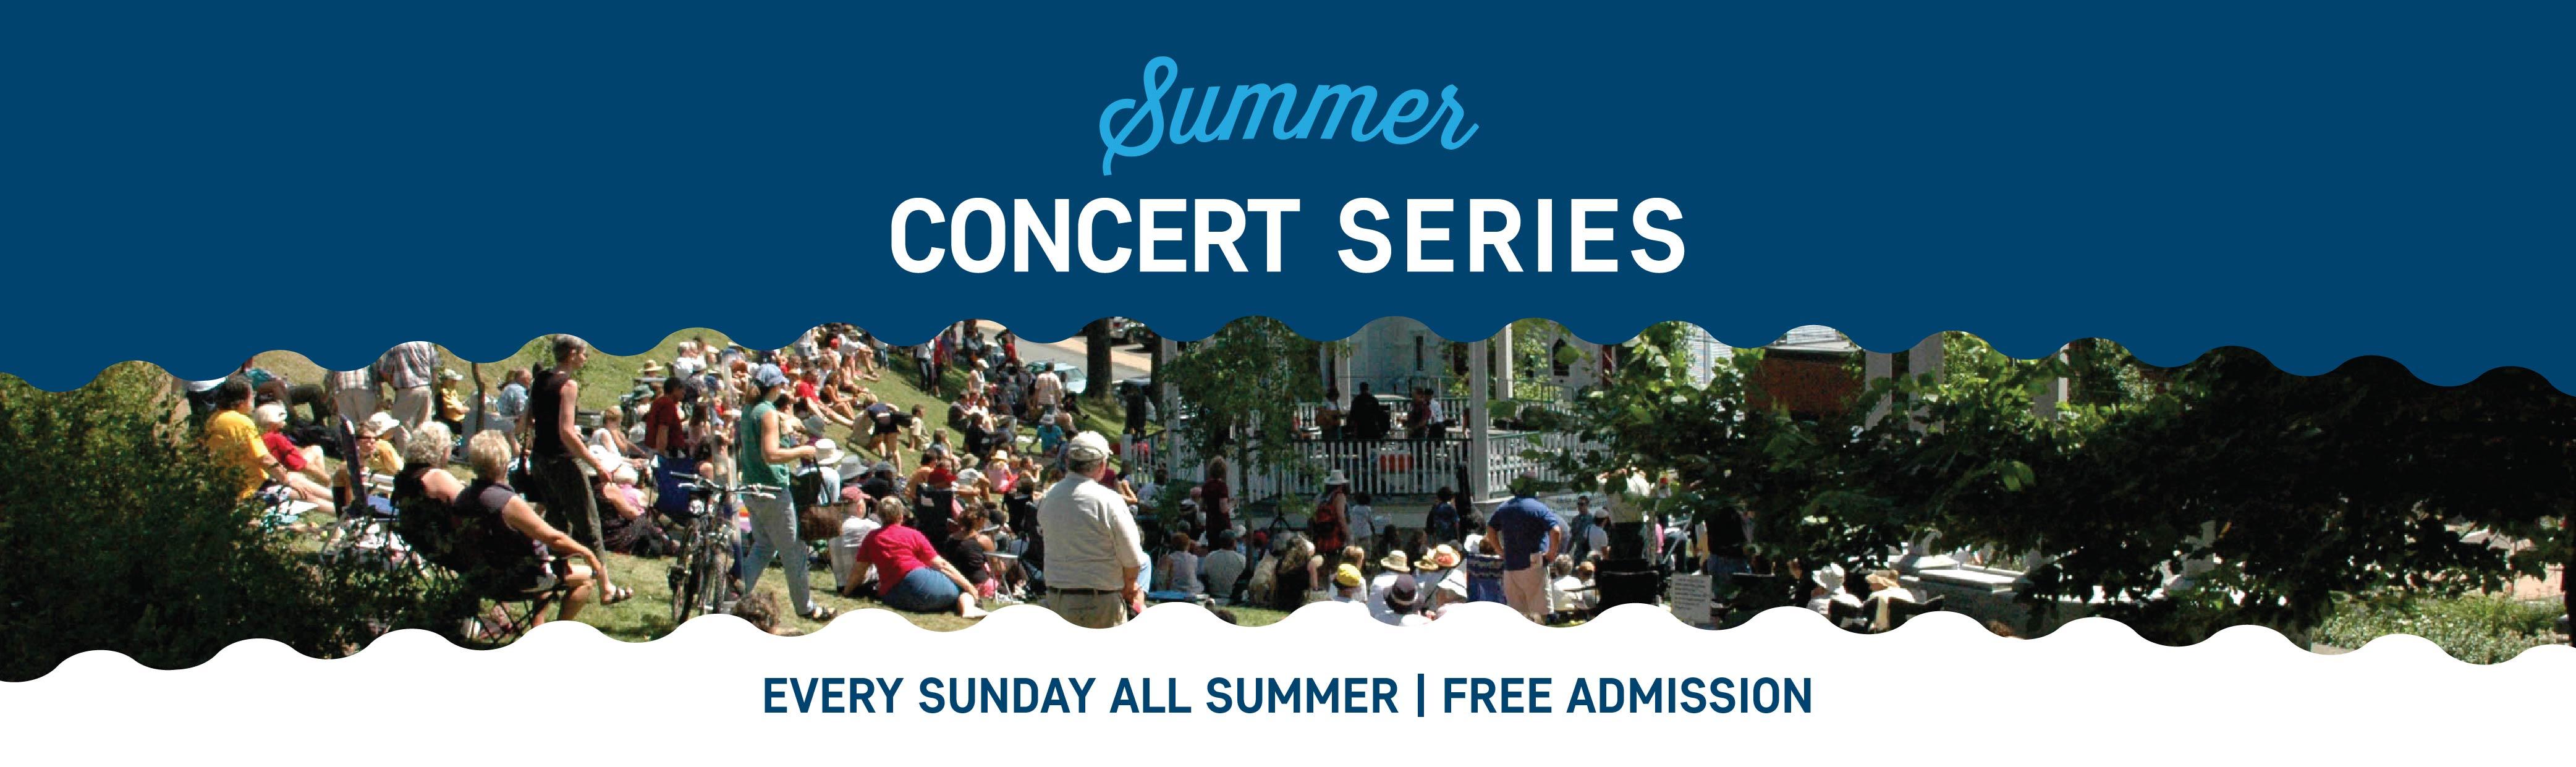 Summer Concert Series WEB Banners